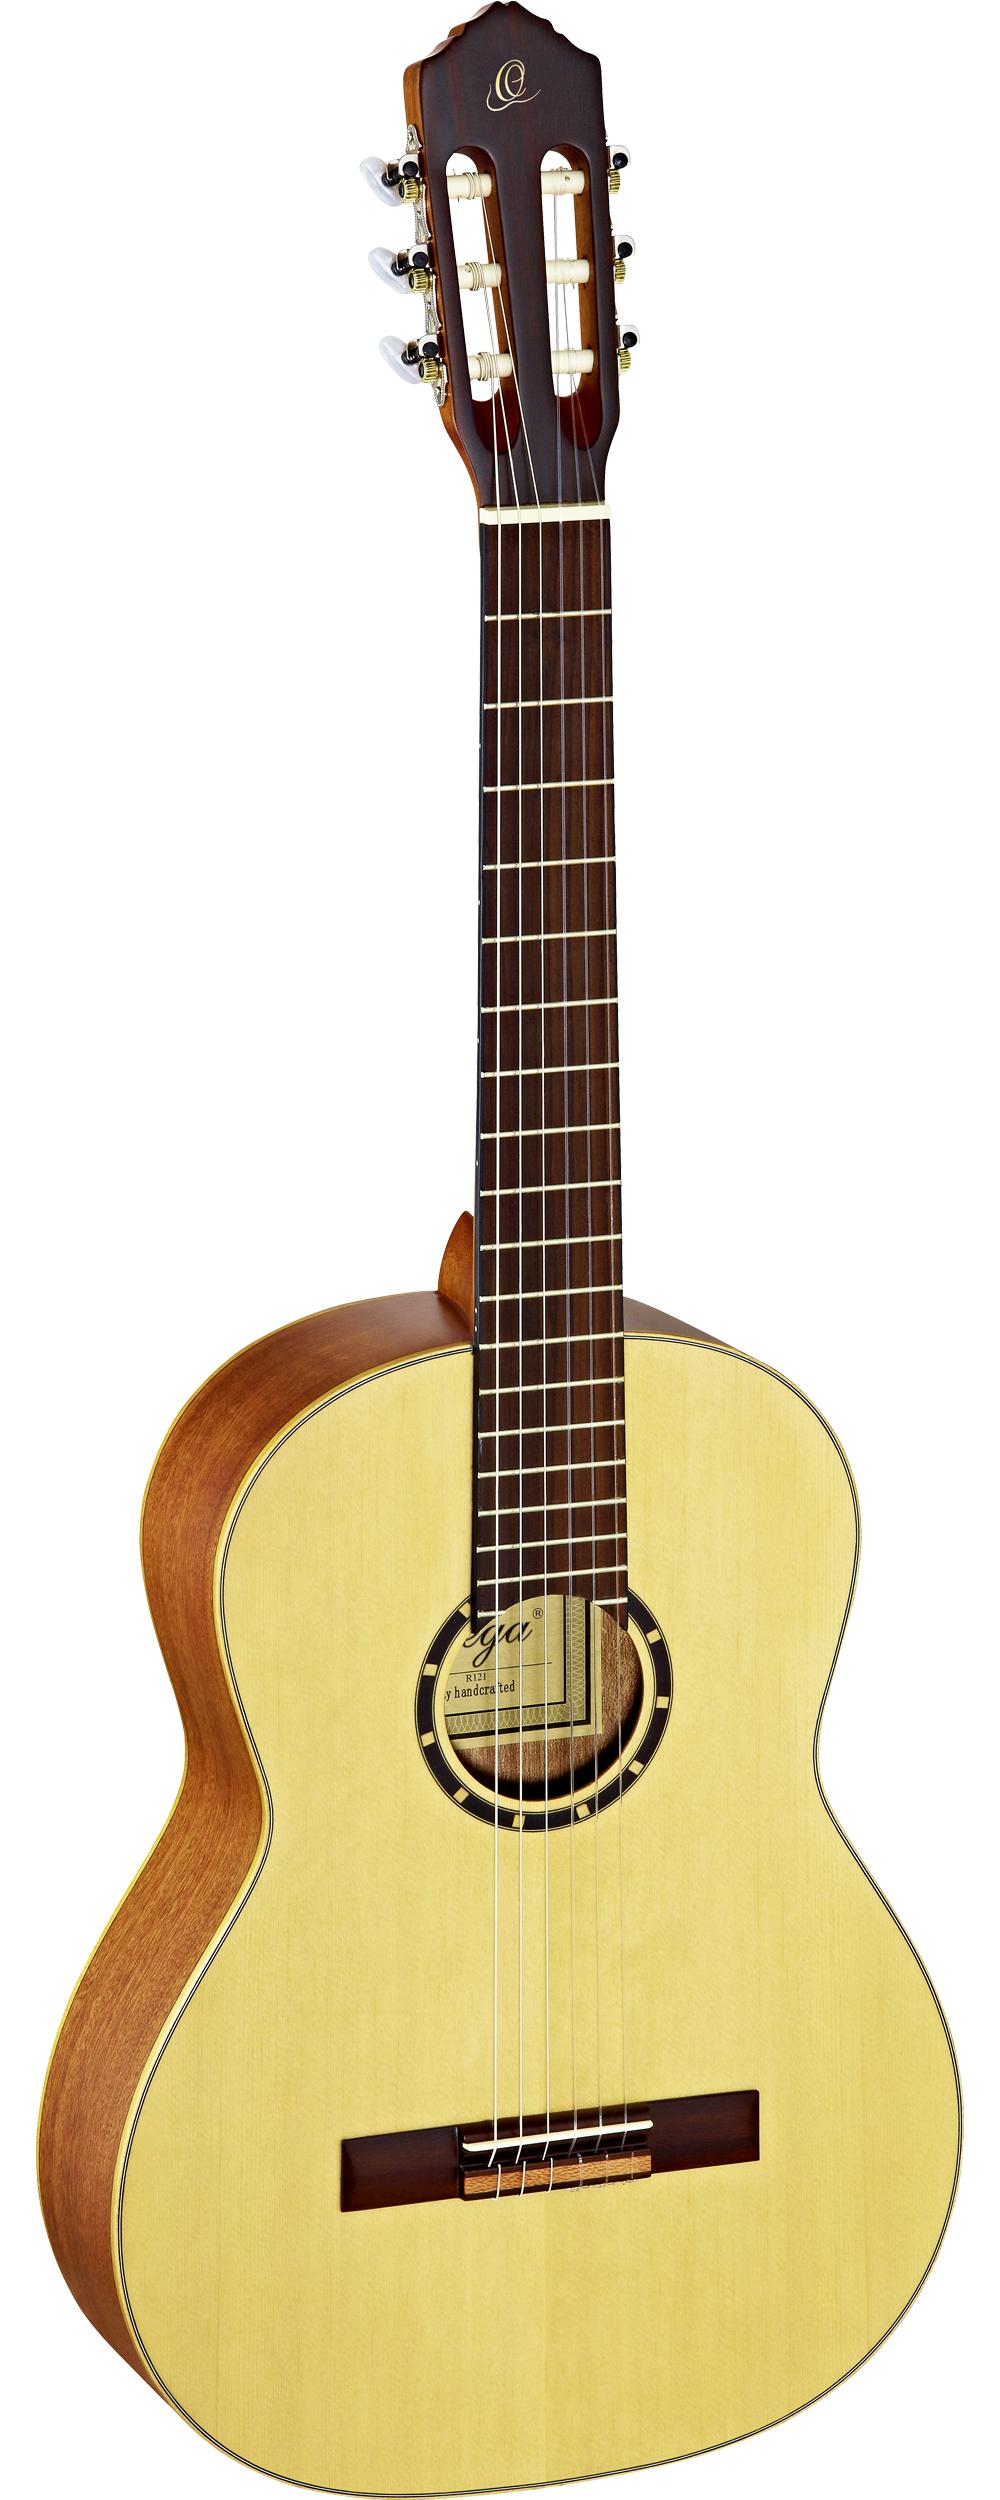 Ortega R 121 4/4 Konzertgitarre